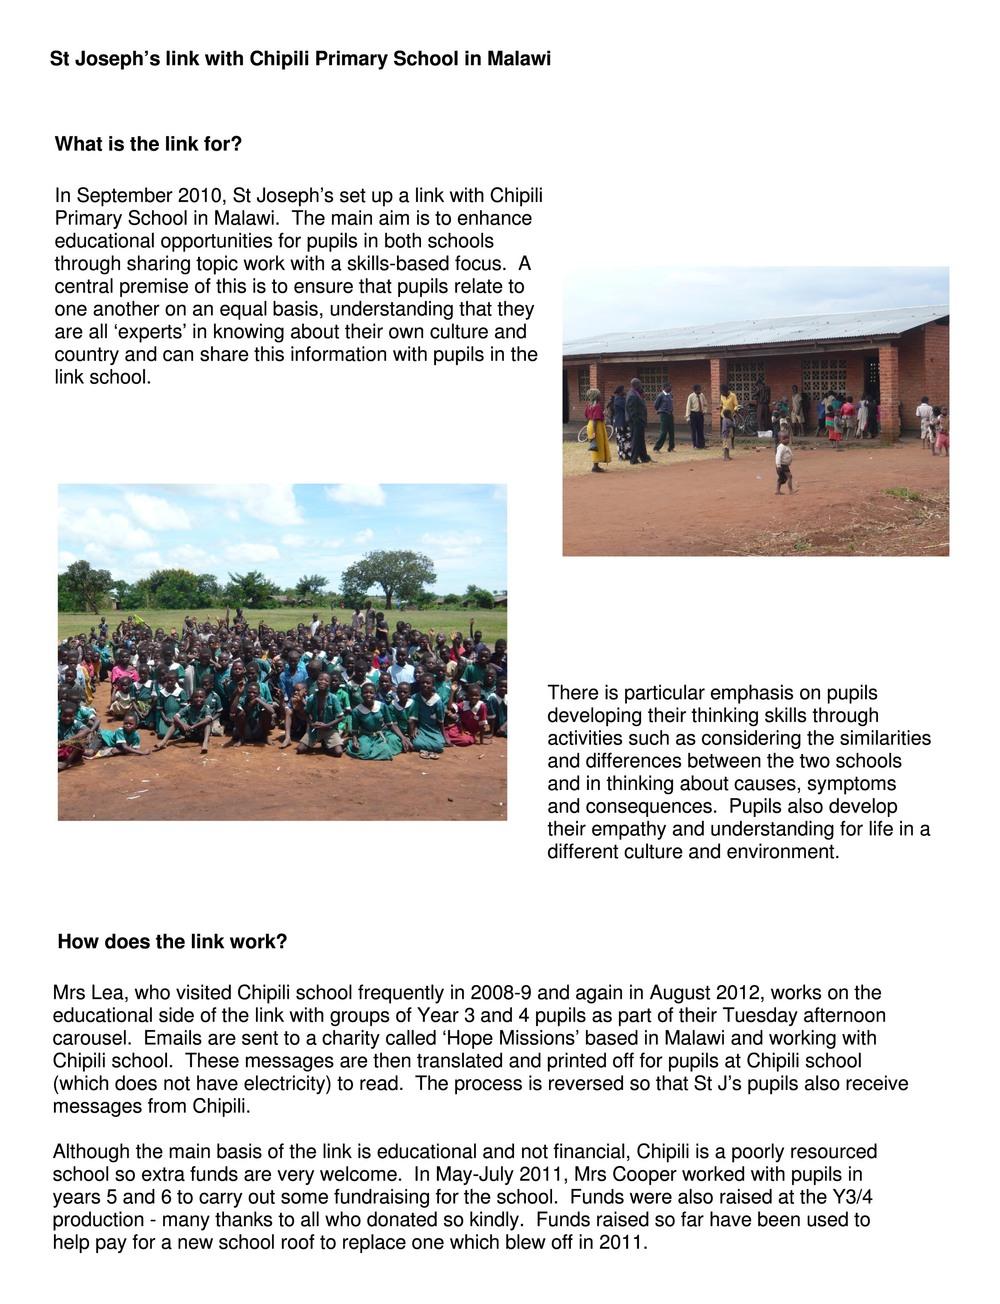 Chipili Primary School, Malawi